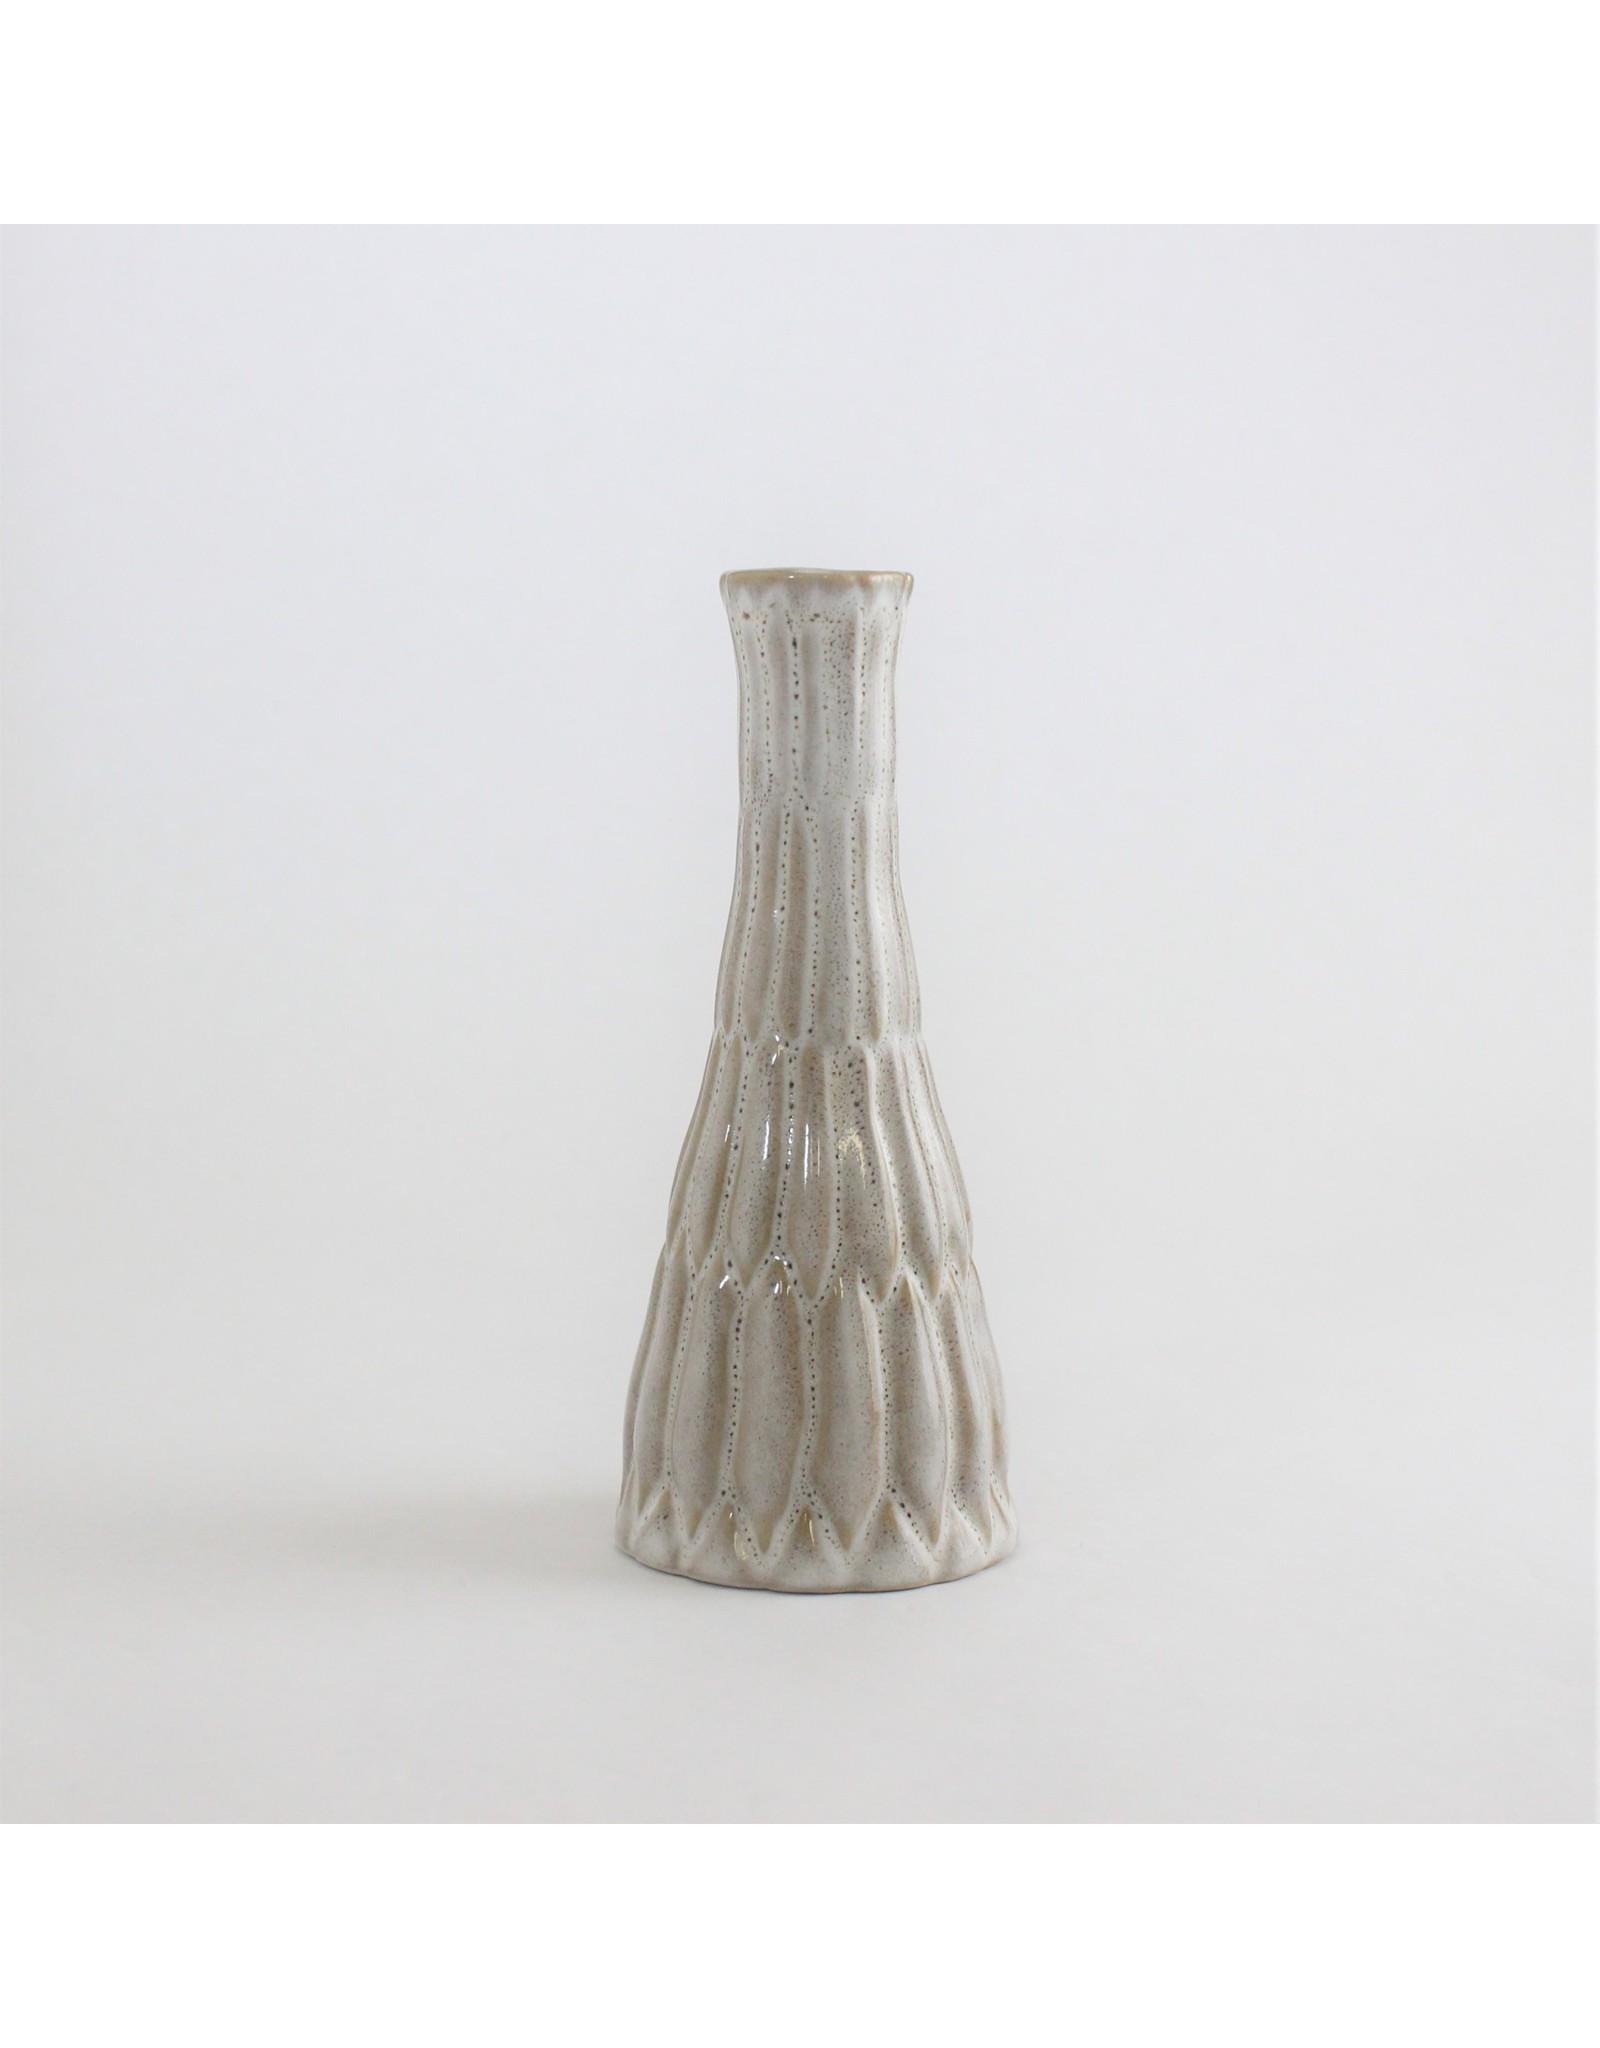 Brown-Cream Stoneware Vase